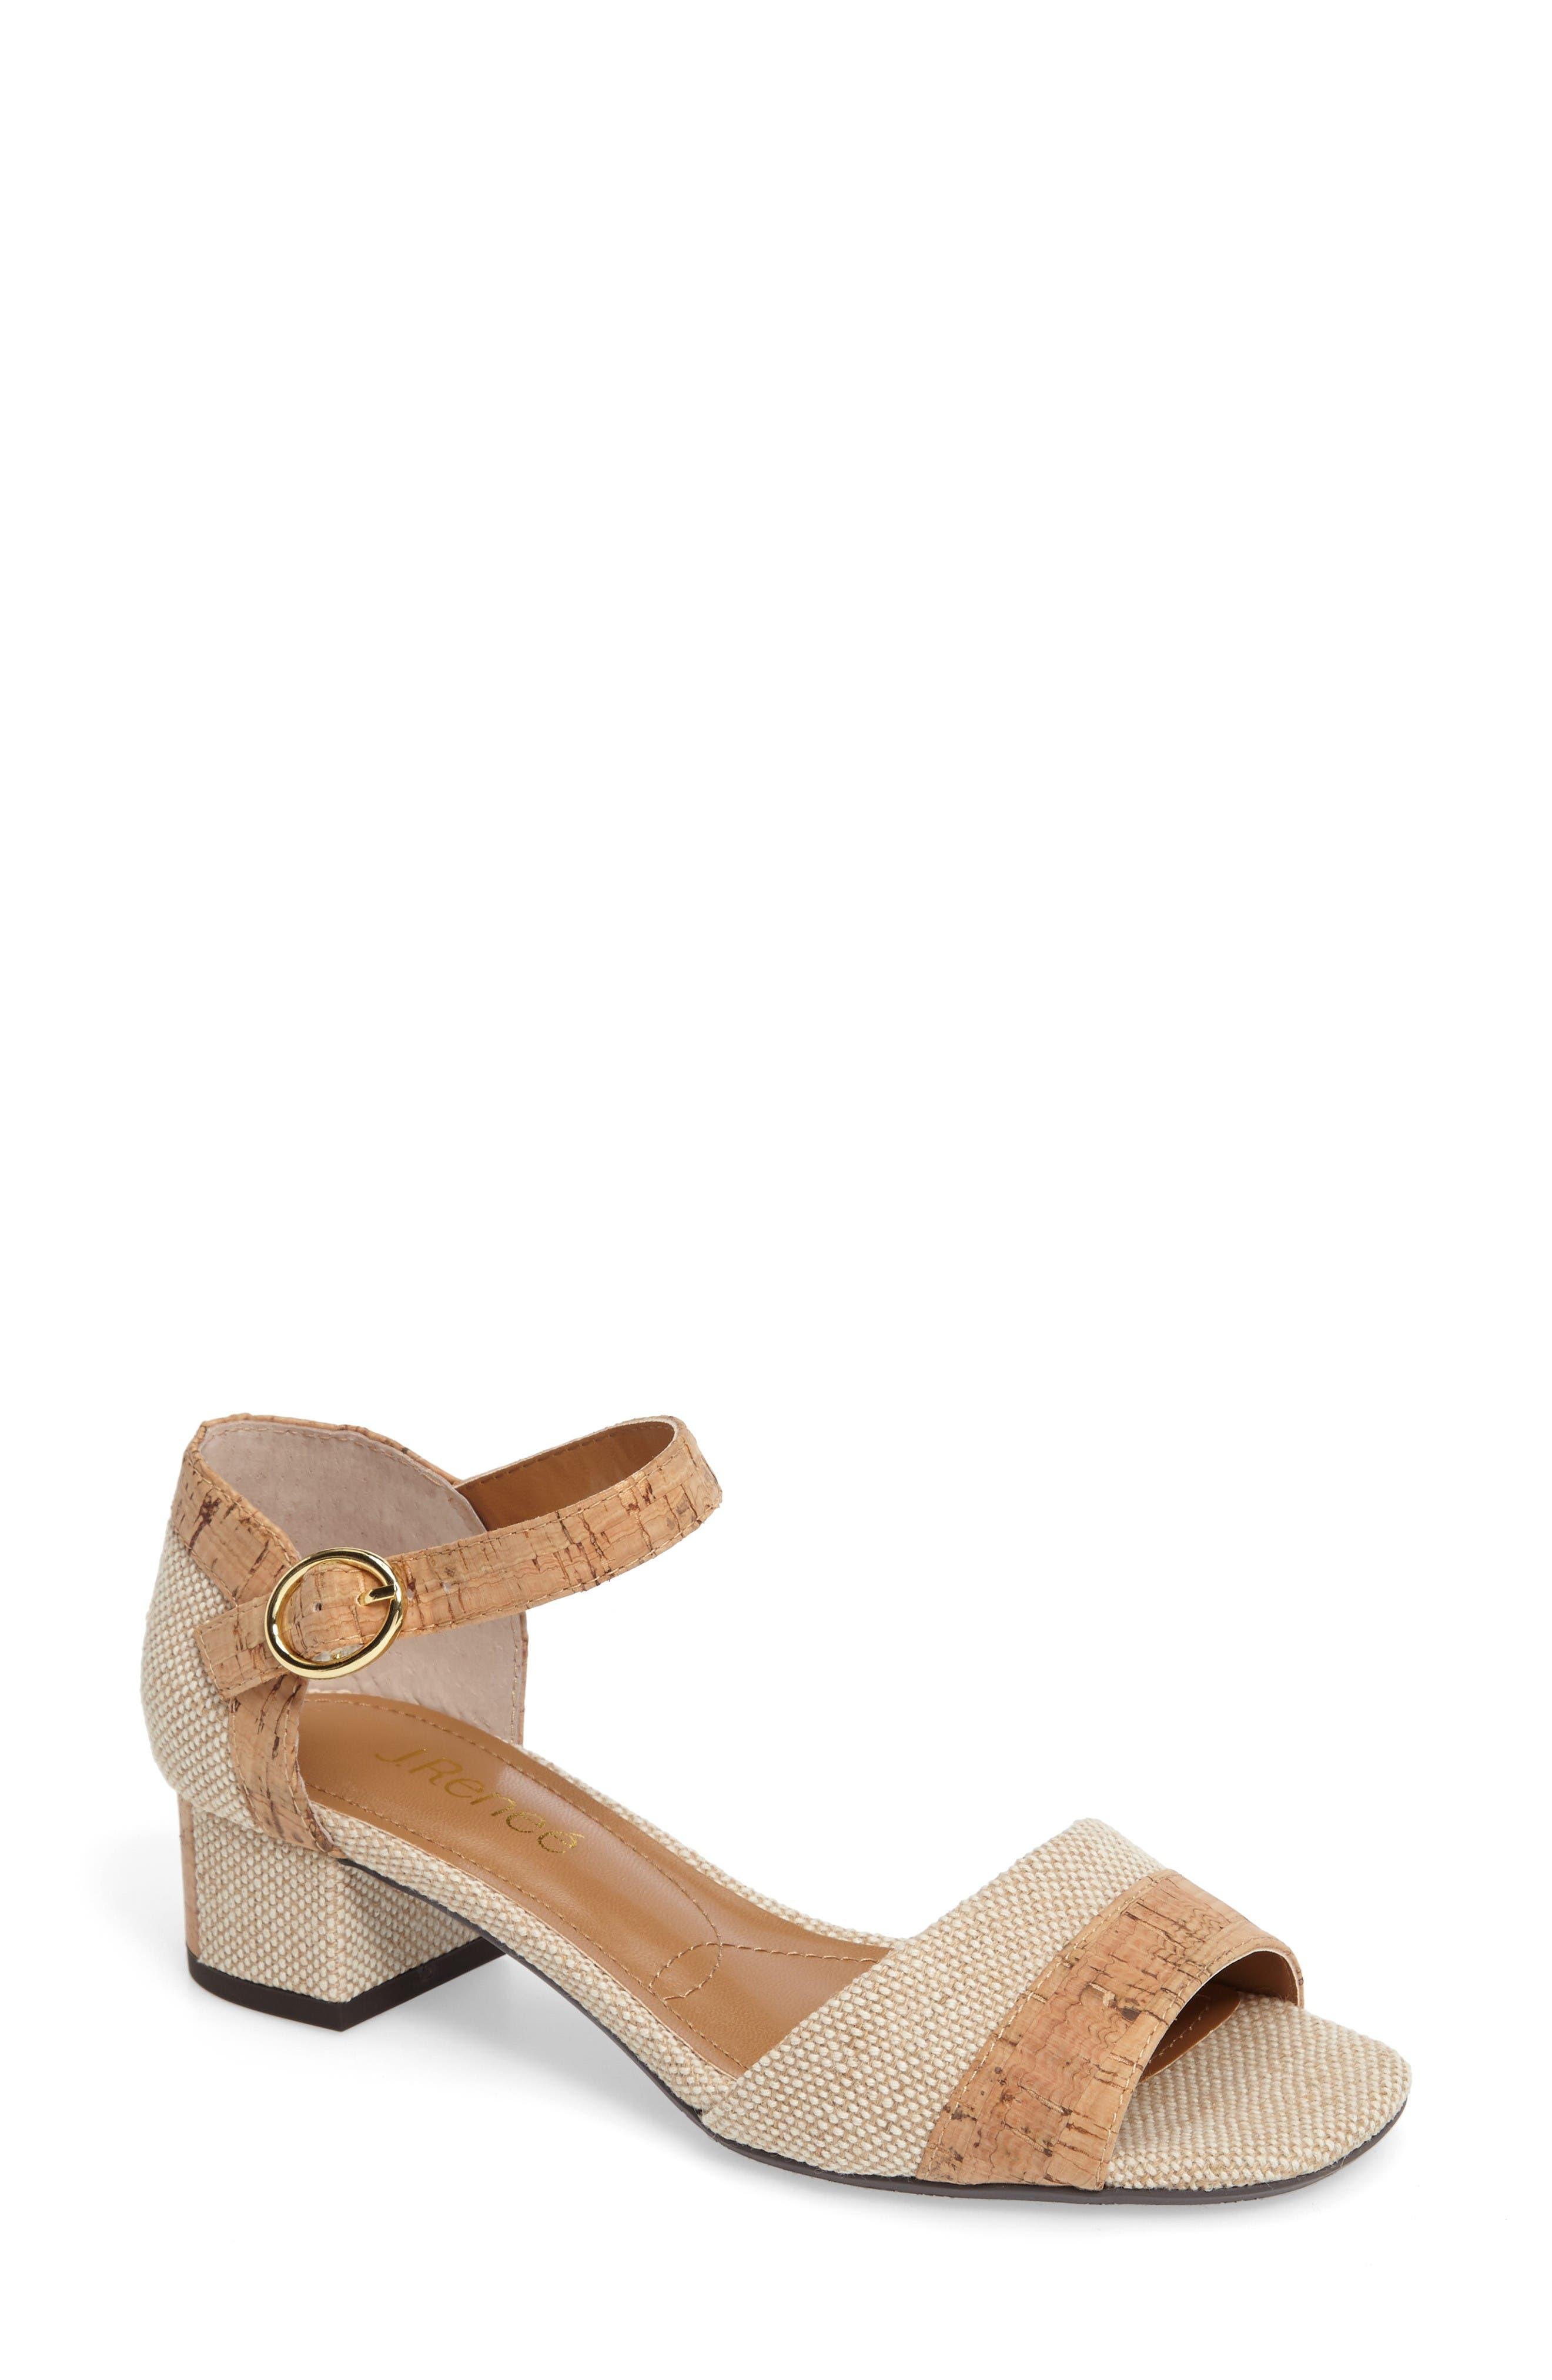 Pebblebeach Block Heel Sandal,                             Main thumbnail 1, color,                             Natural/ Cork Fabric